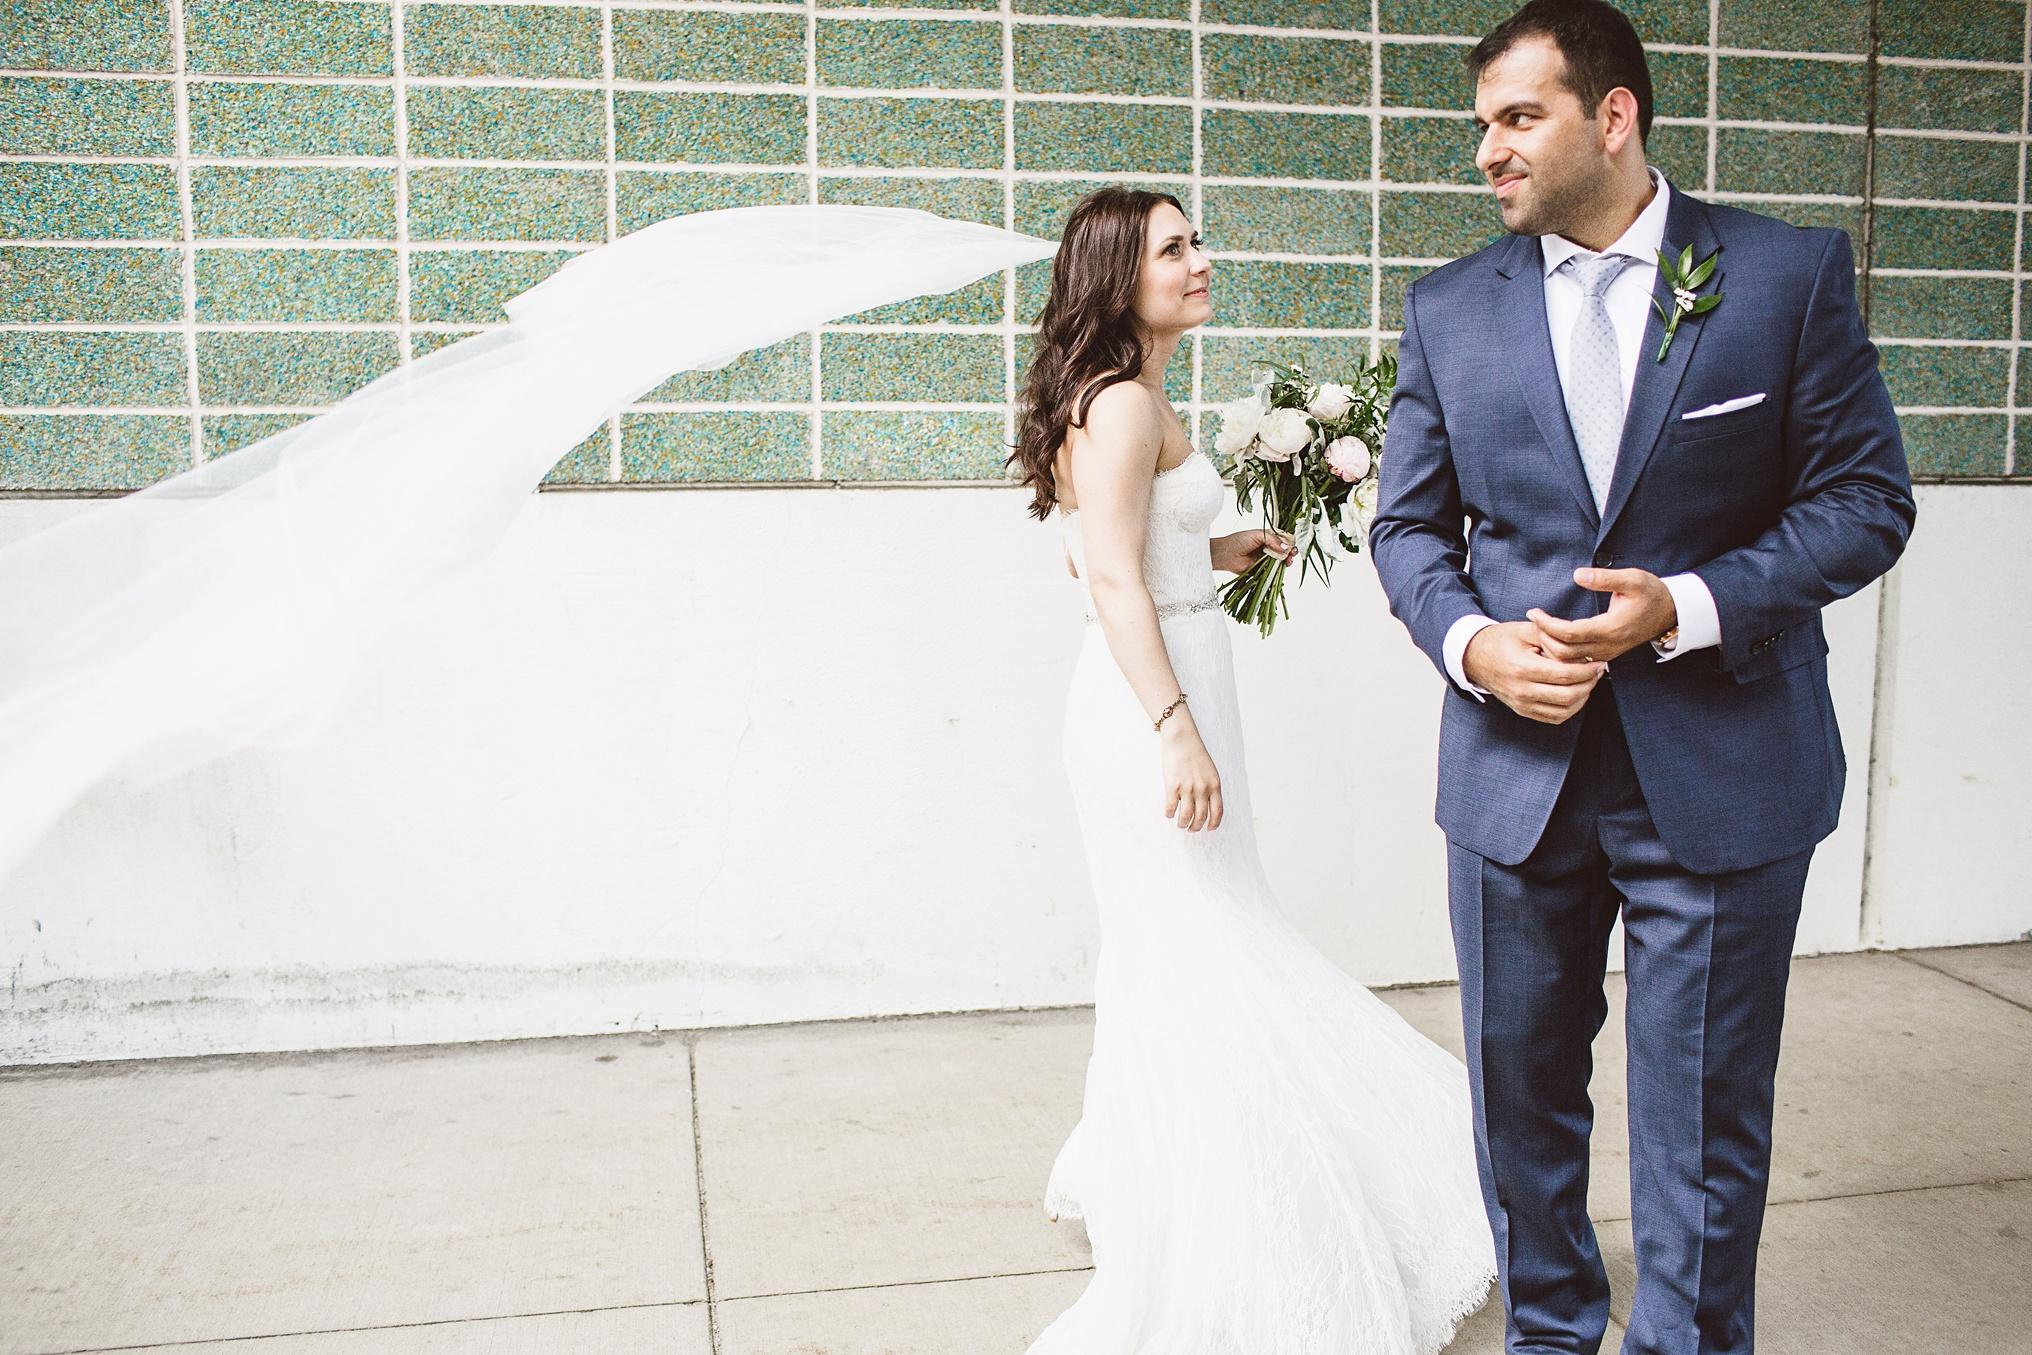 best_wedding_photography_2017_by_lucas_botz_photography_140.jpg